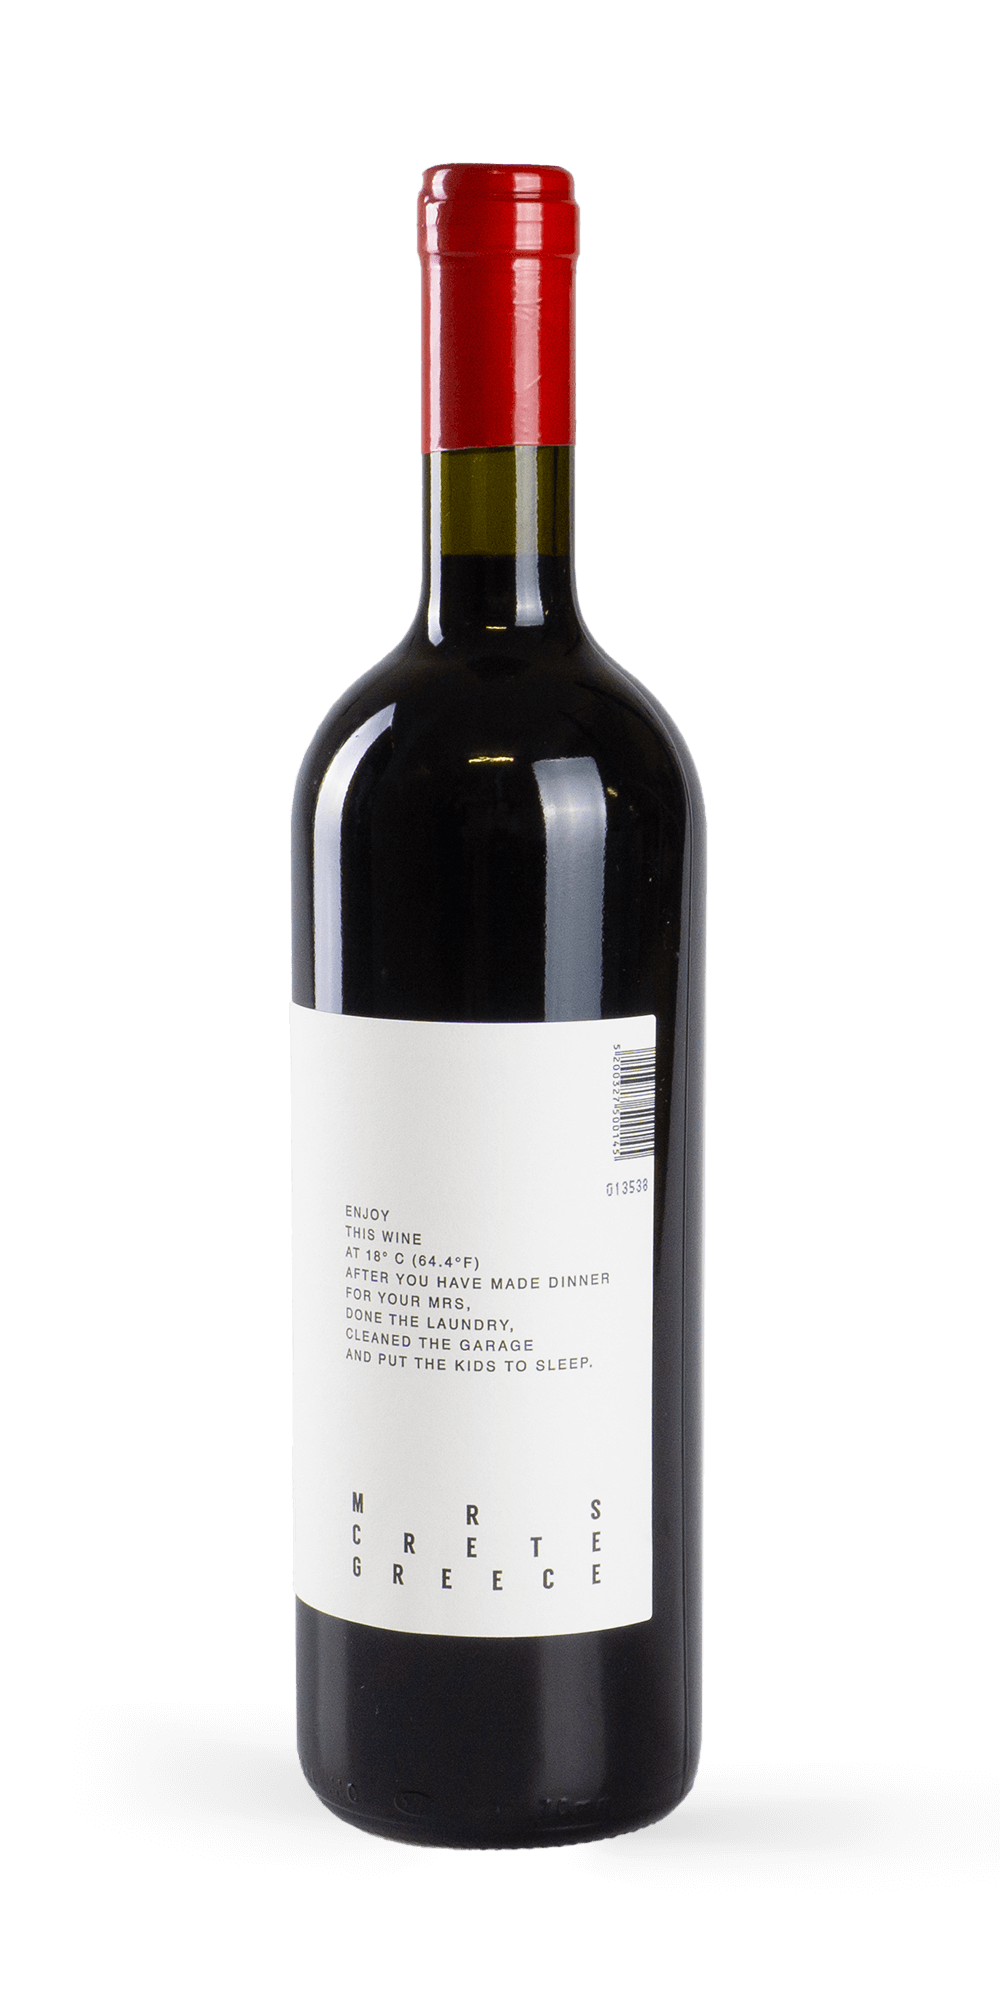 MRS 2020 - Manousakis Winery